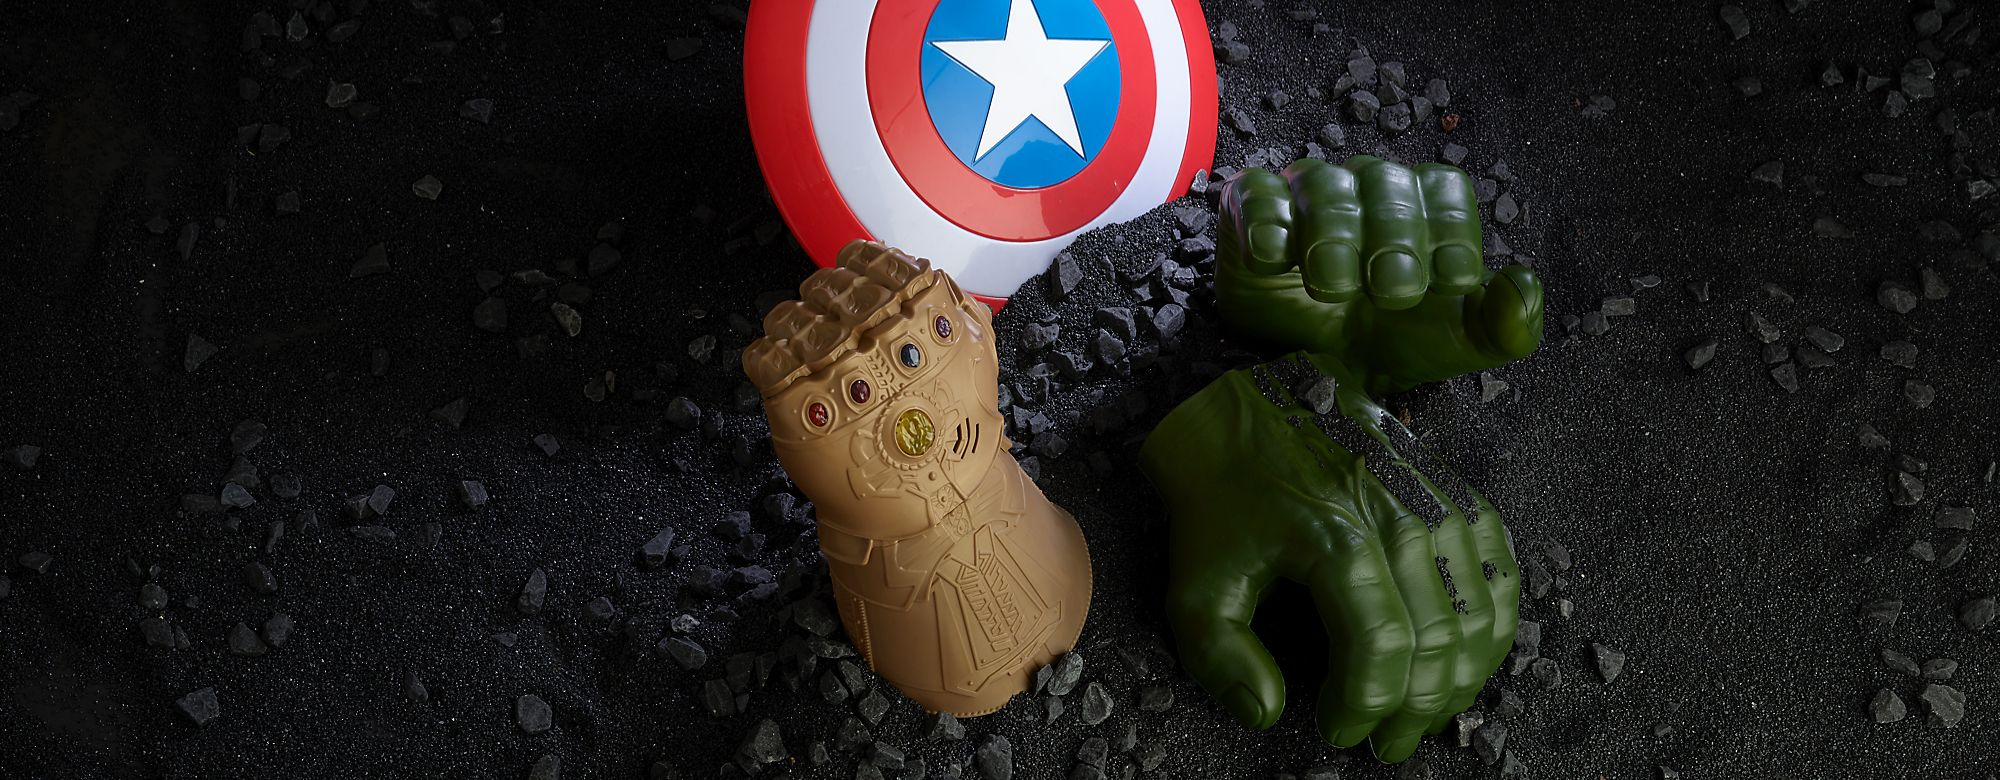 1004ee0131 Personaggi Marvel Store | shopDisney